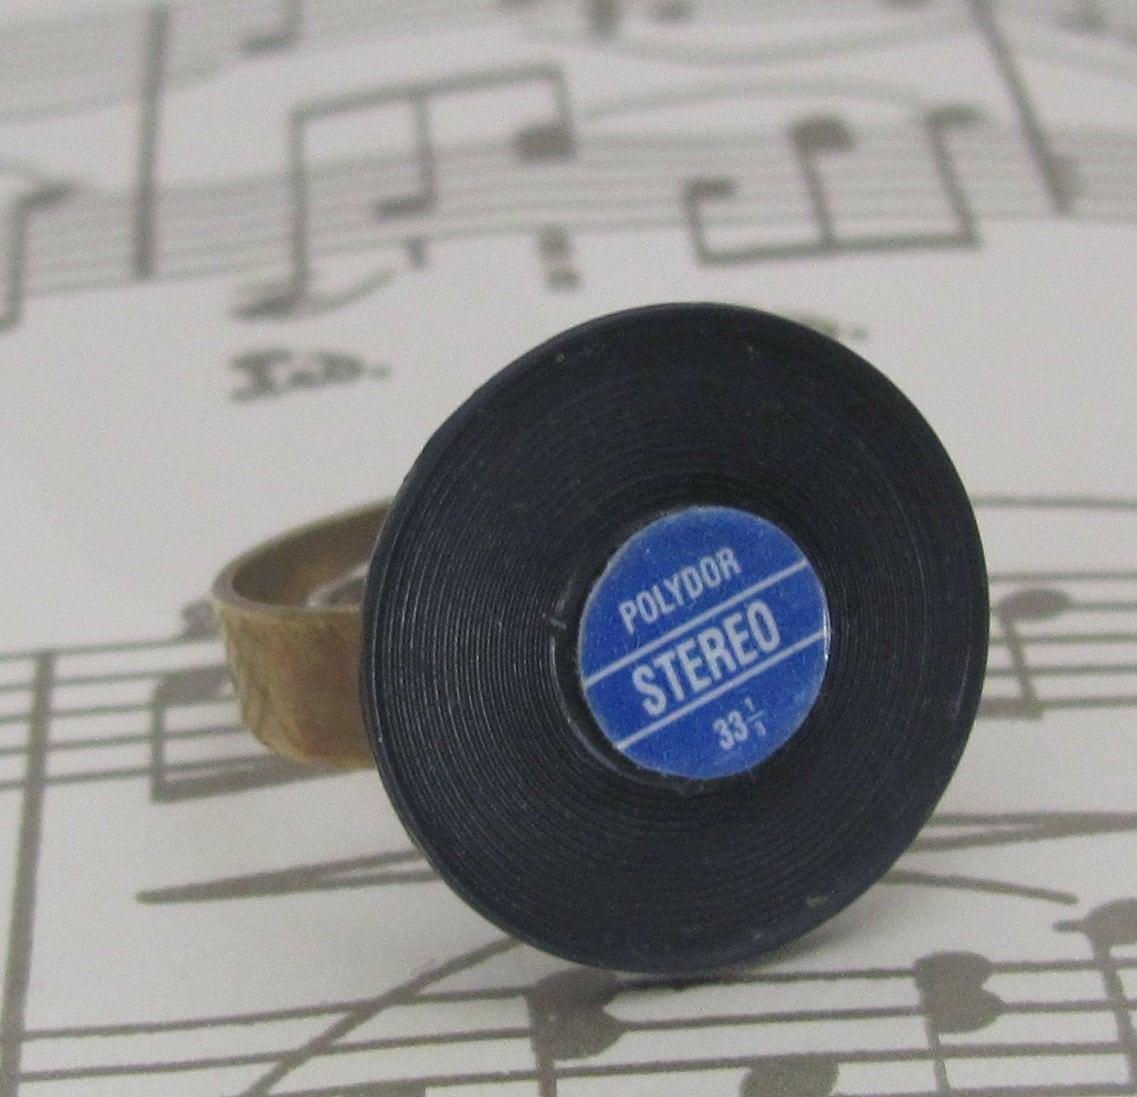 Recordhit: Hit Single Record Miniature Vinyl 45 Album Ring